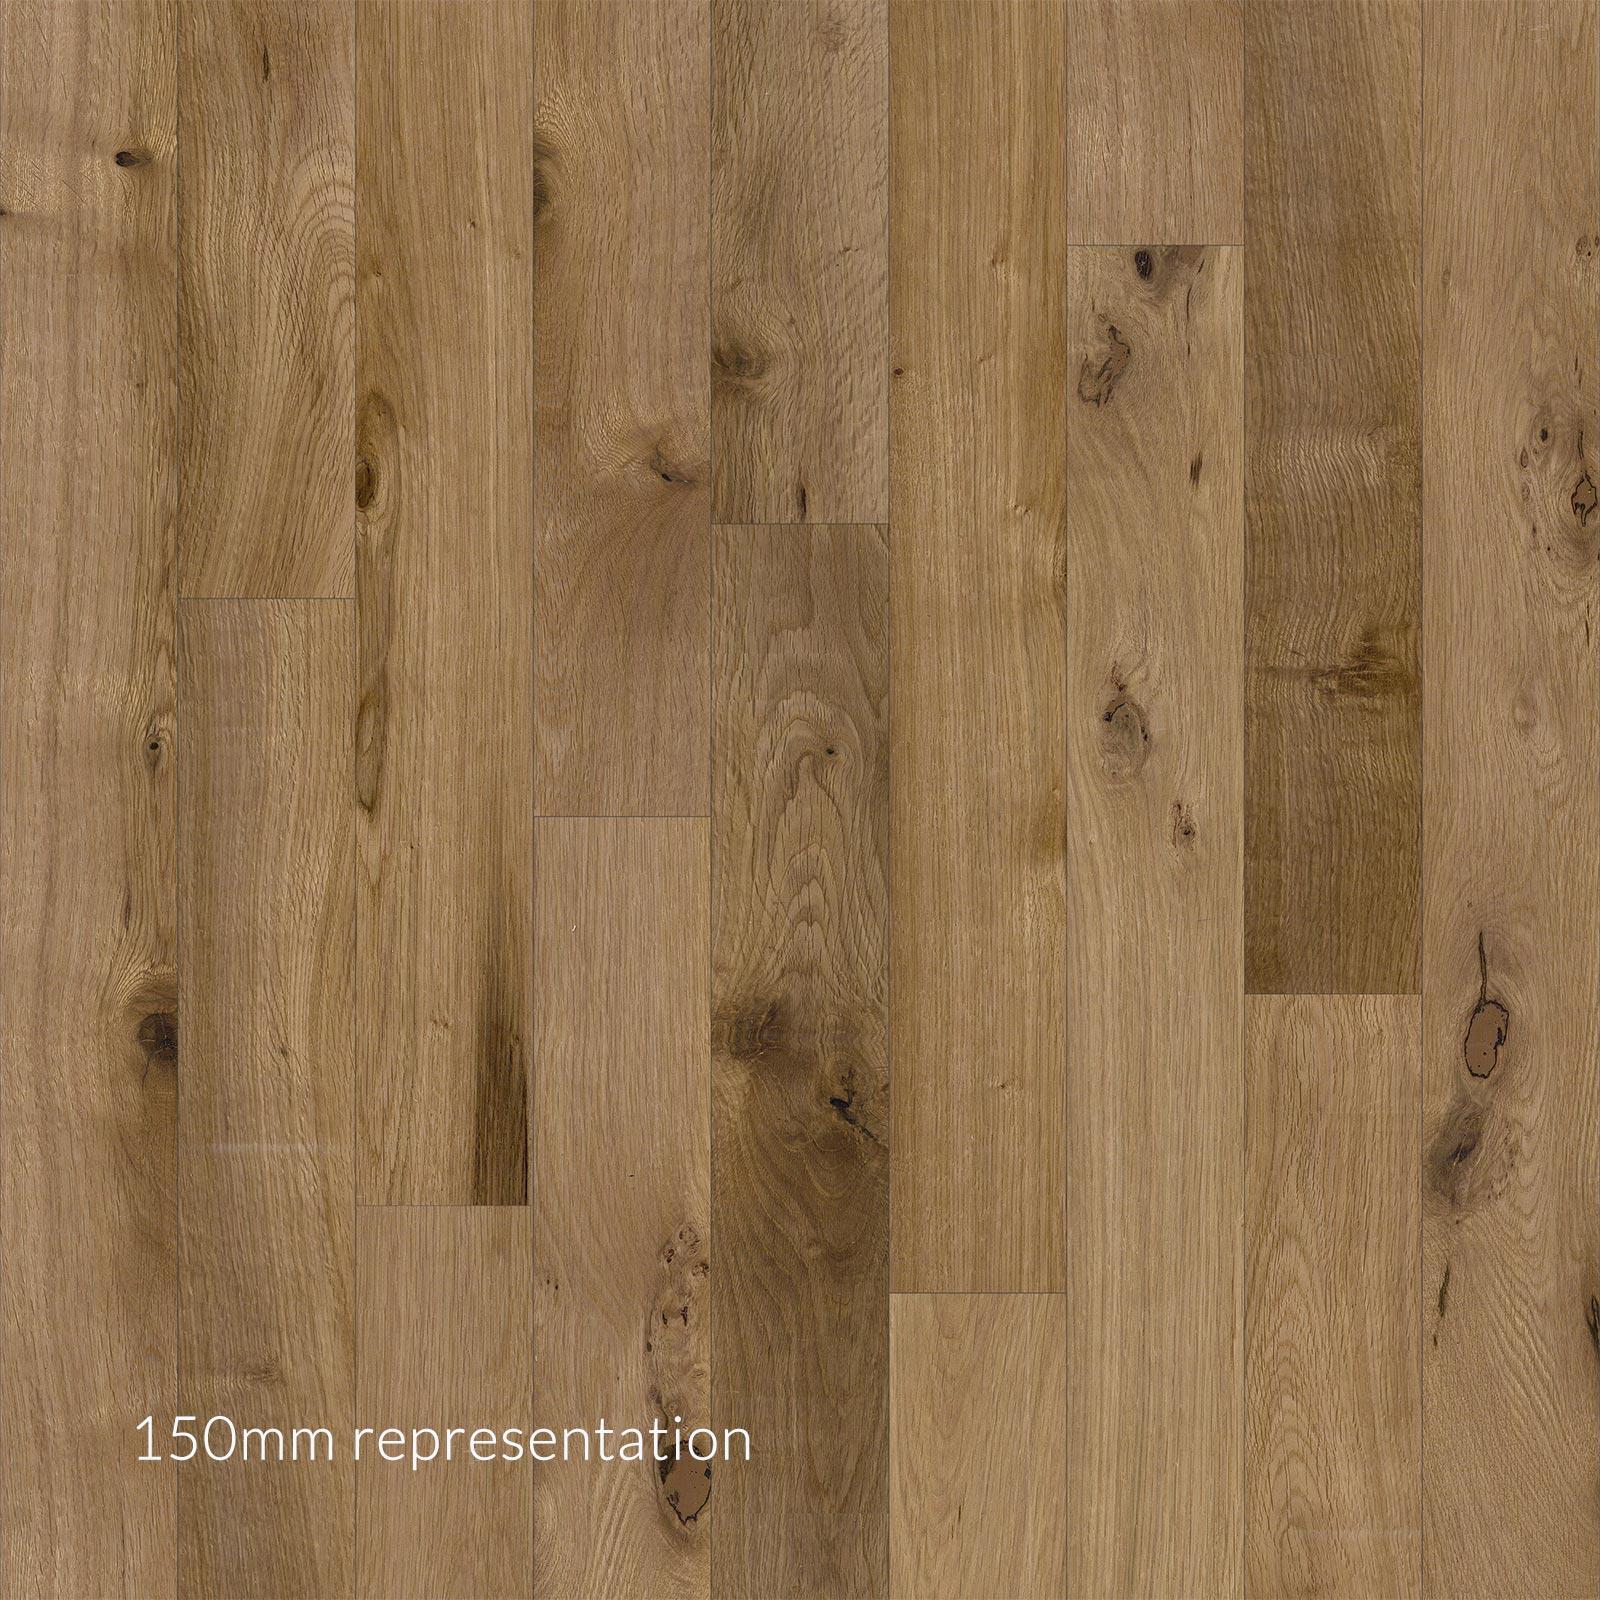 3025 Hardwood Laminate And Lvt Flooring